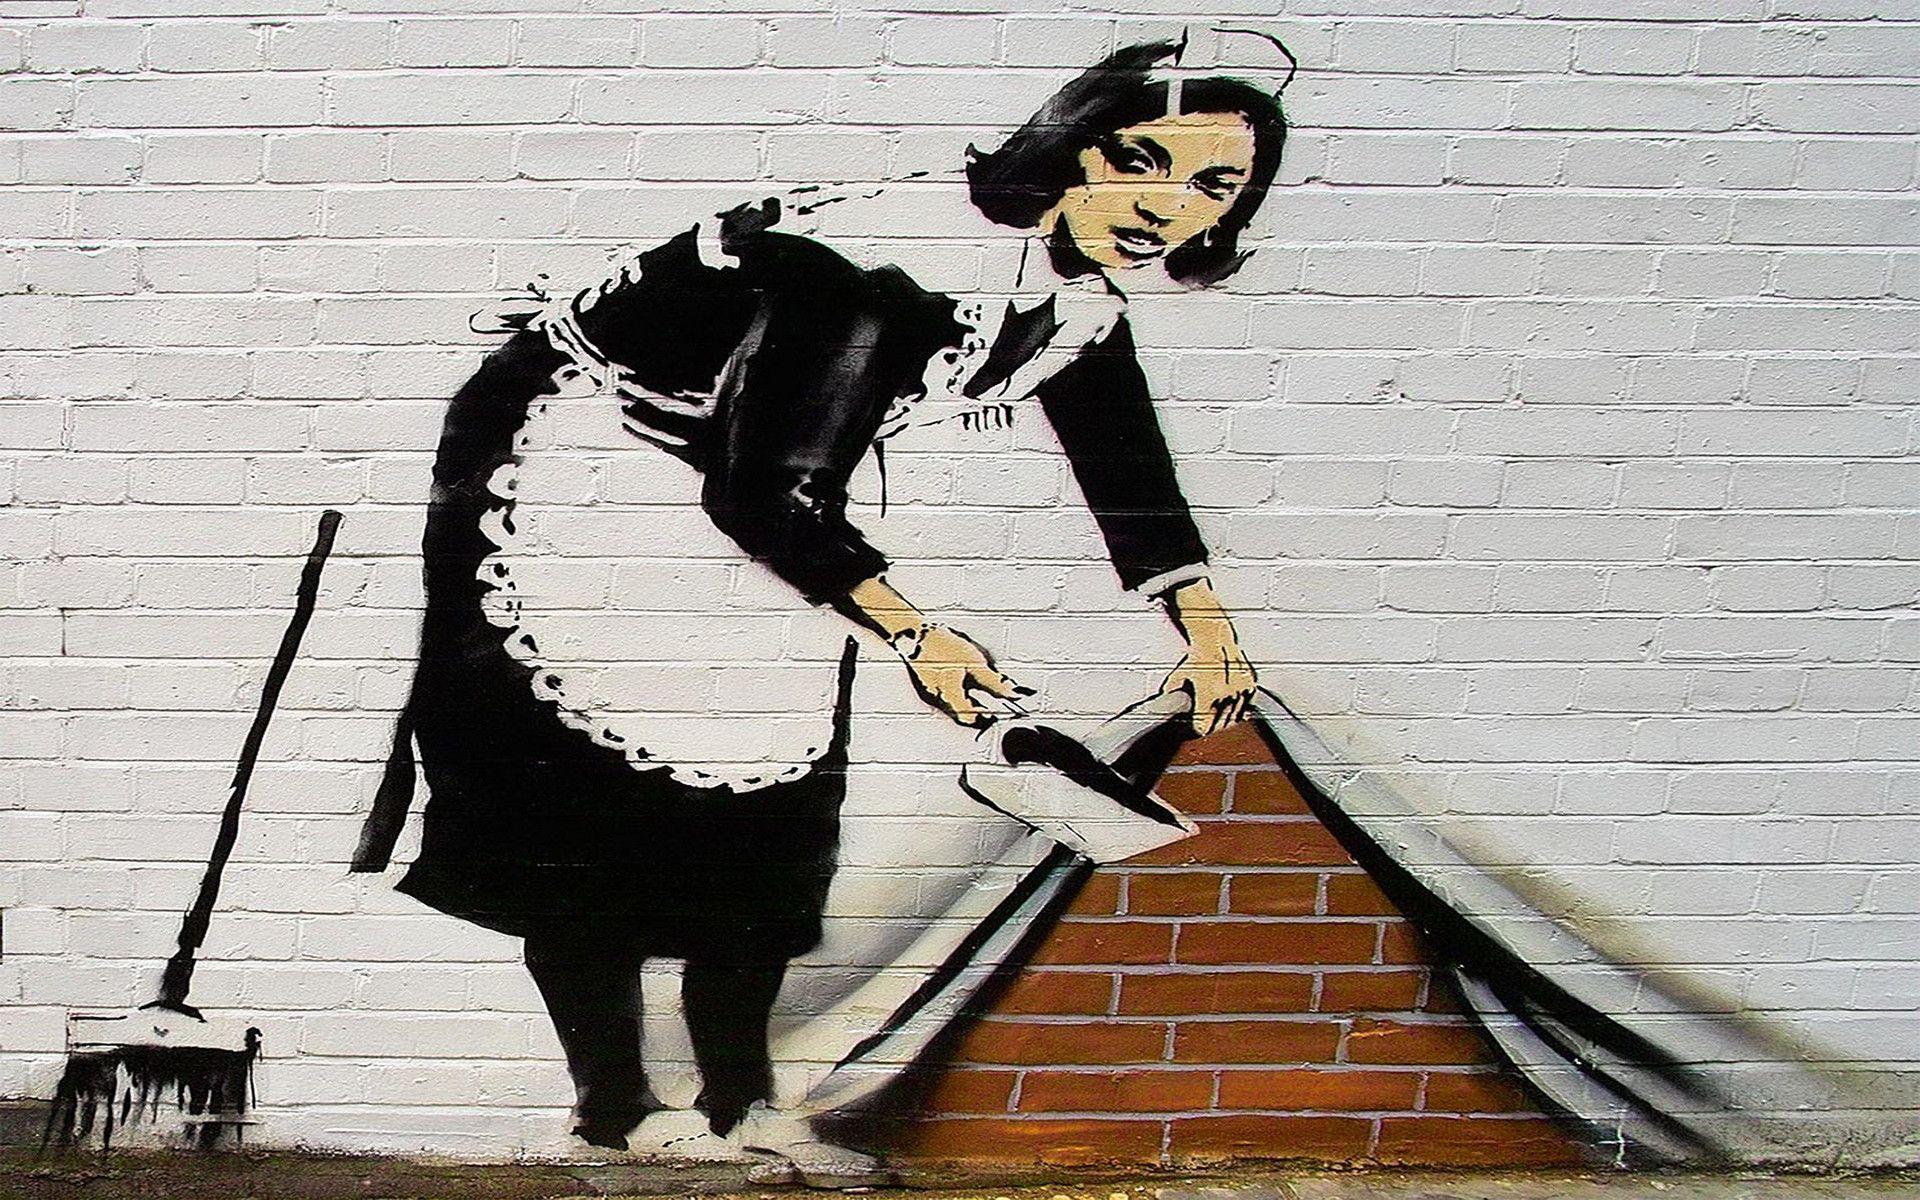 71+ Banksy Wallpaper Hd on WallpaperSafari